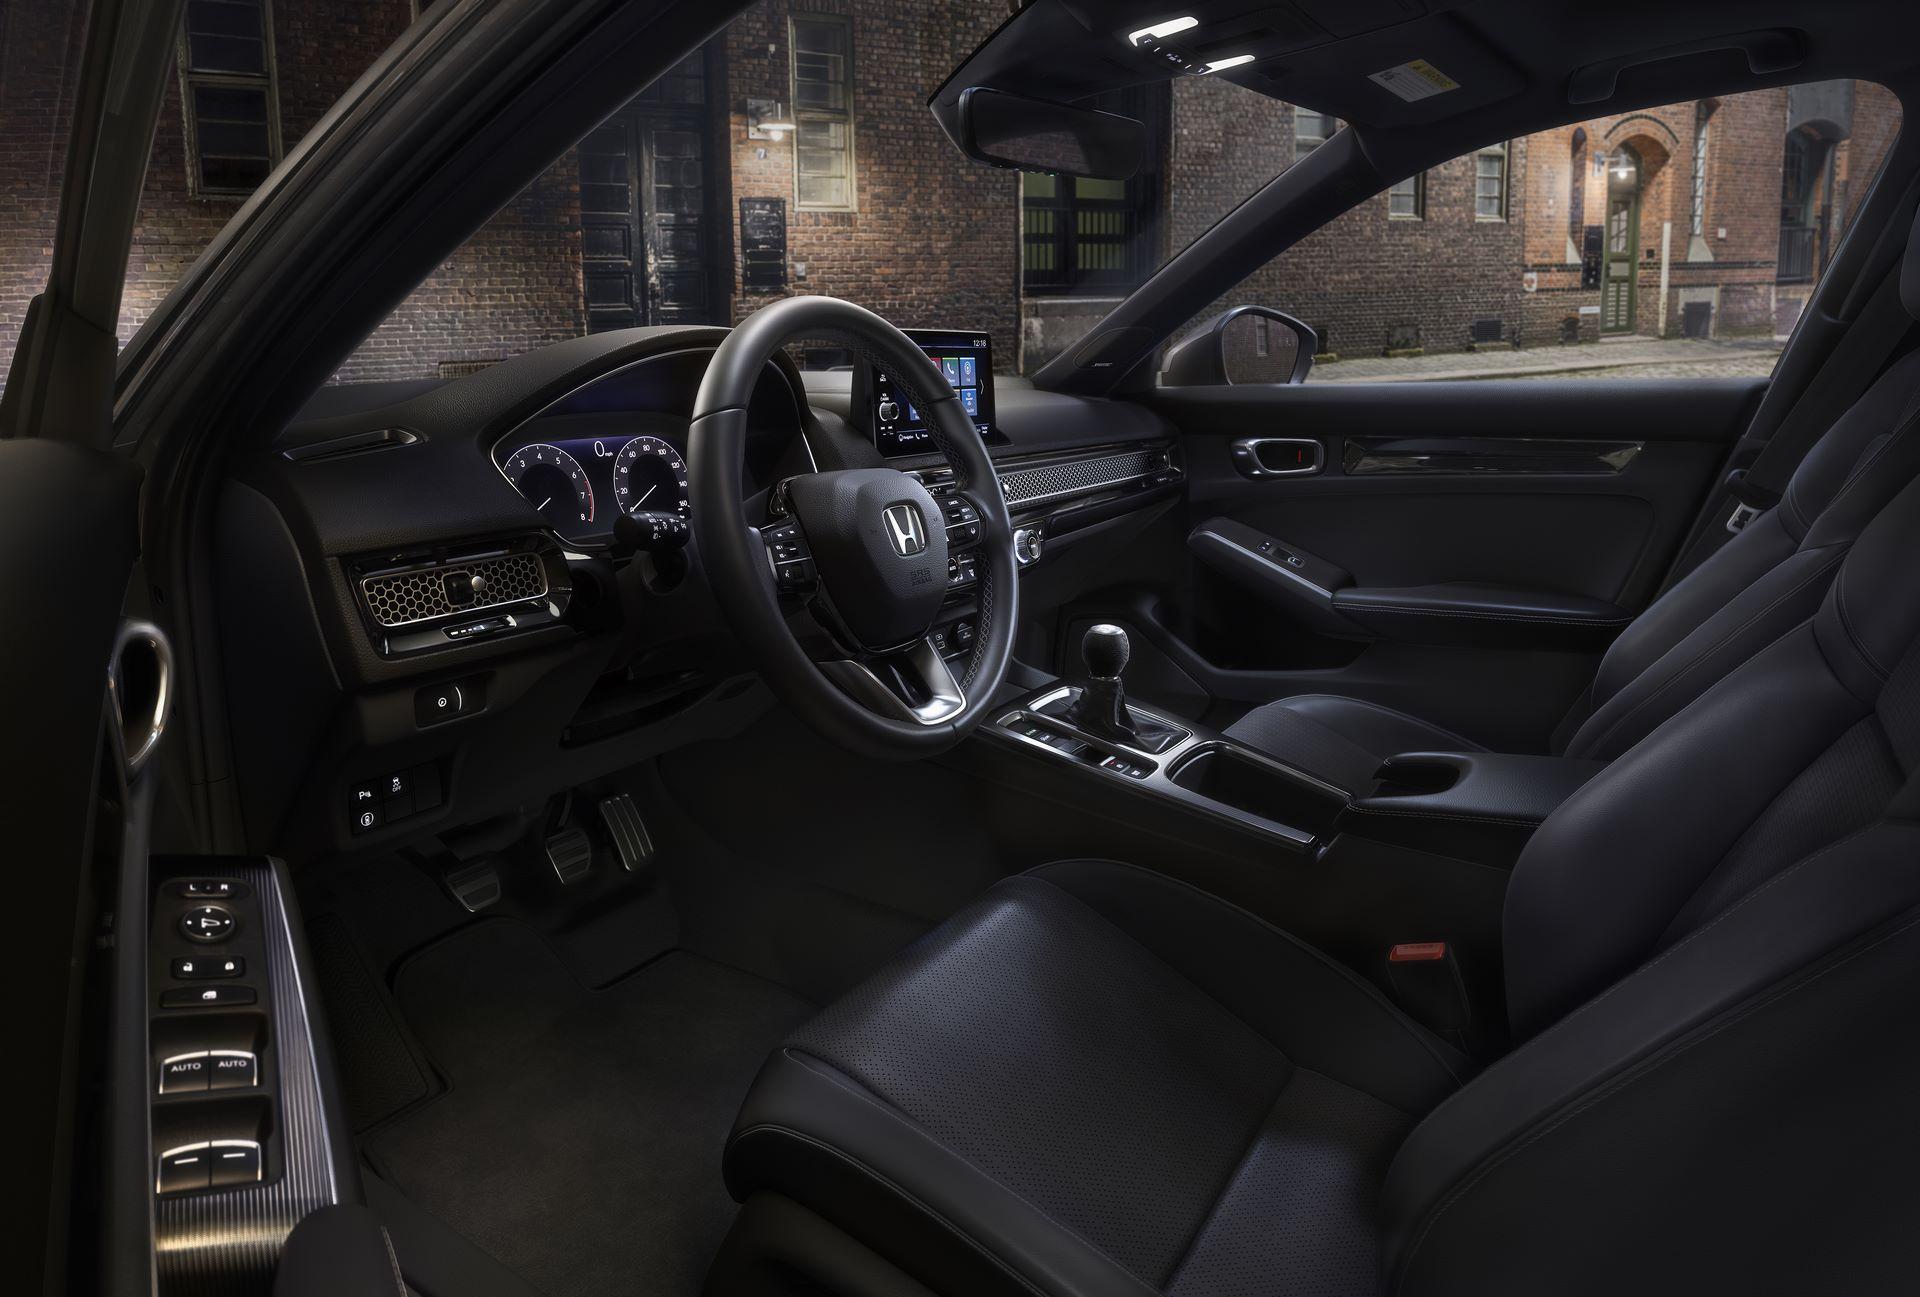 Honda-Civic-hatchback-9